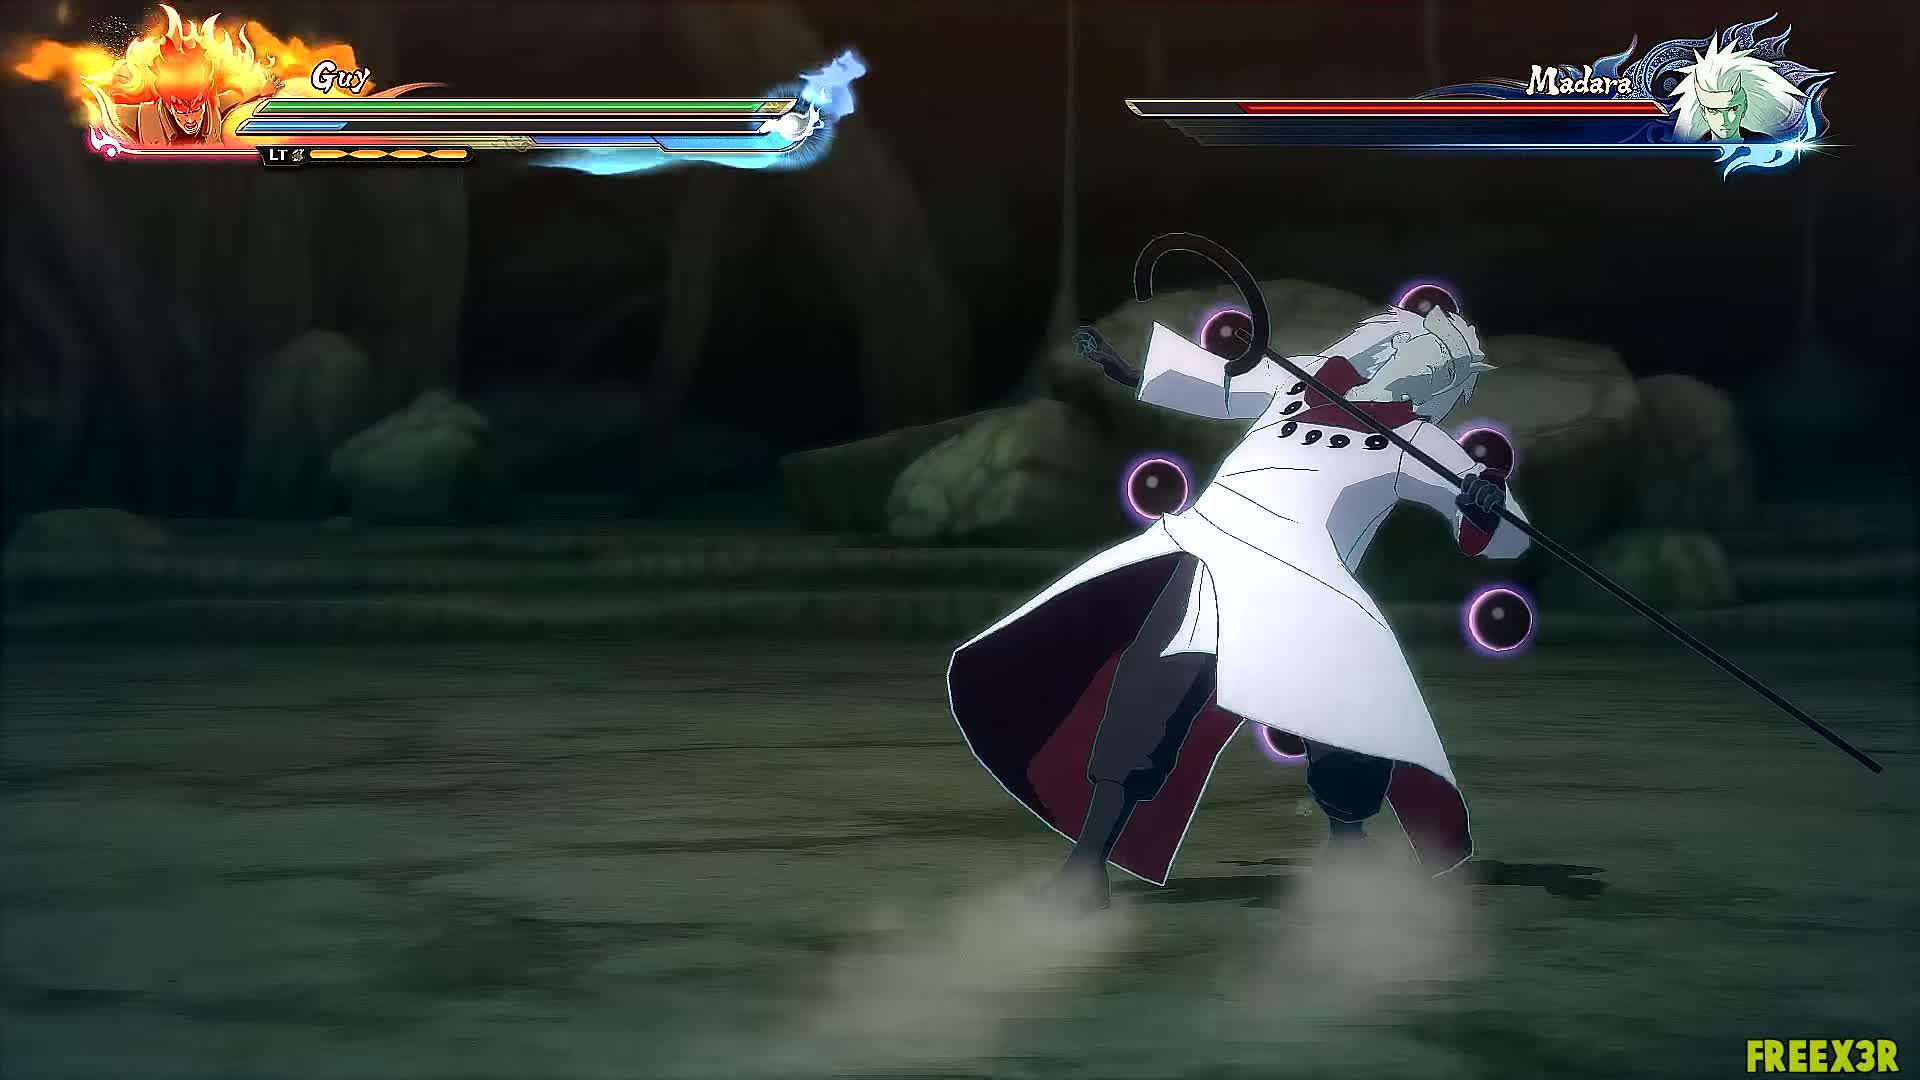 Naruto Shippuden Ultimate Ninja Storm 4 Walkthrough Gifs Search